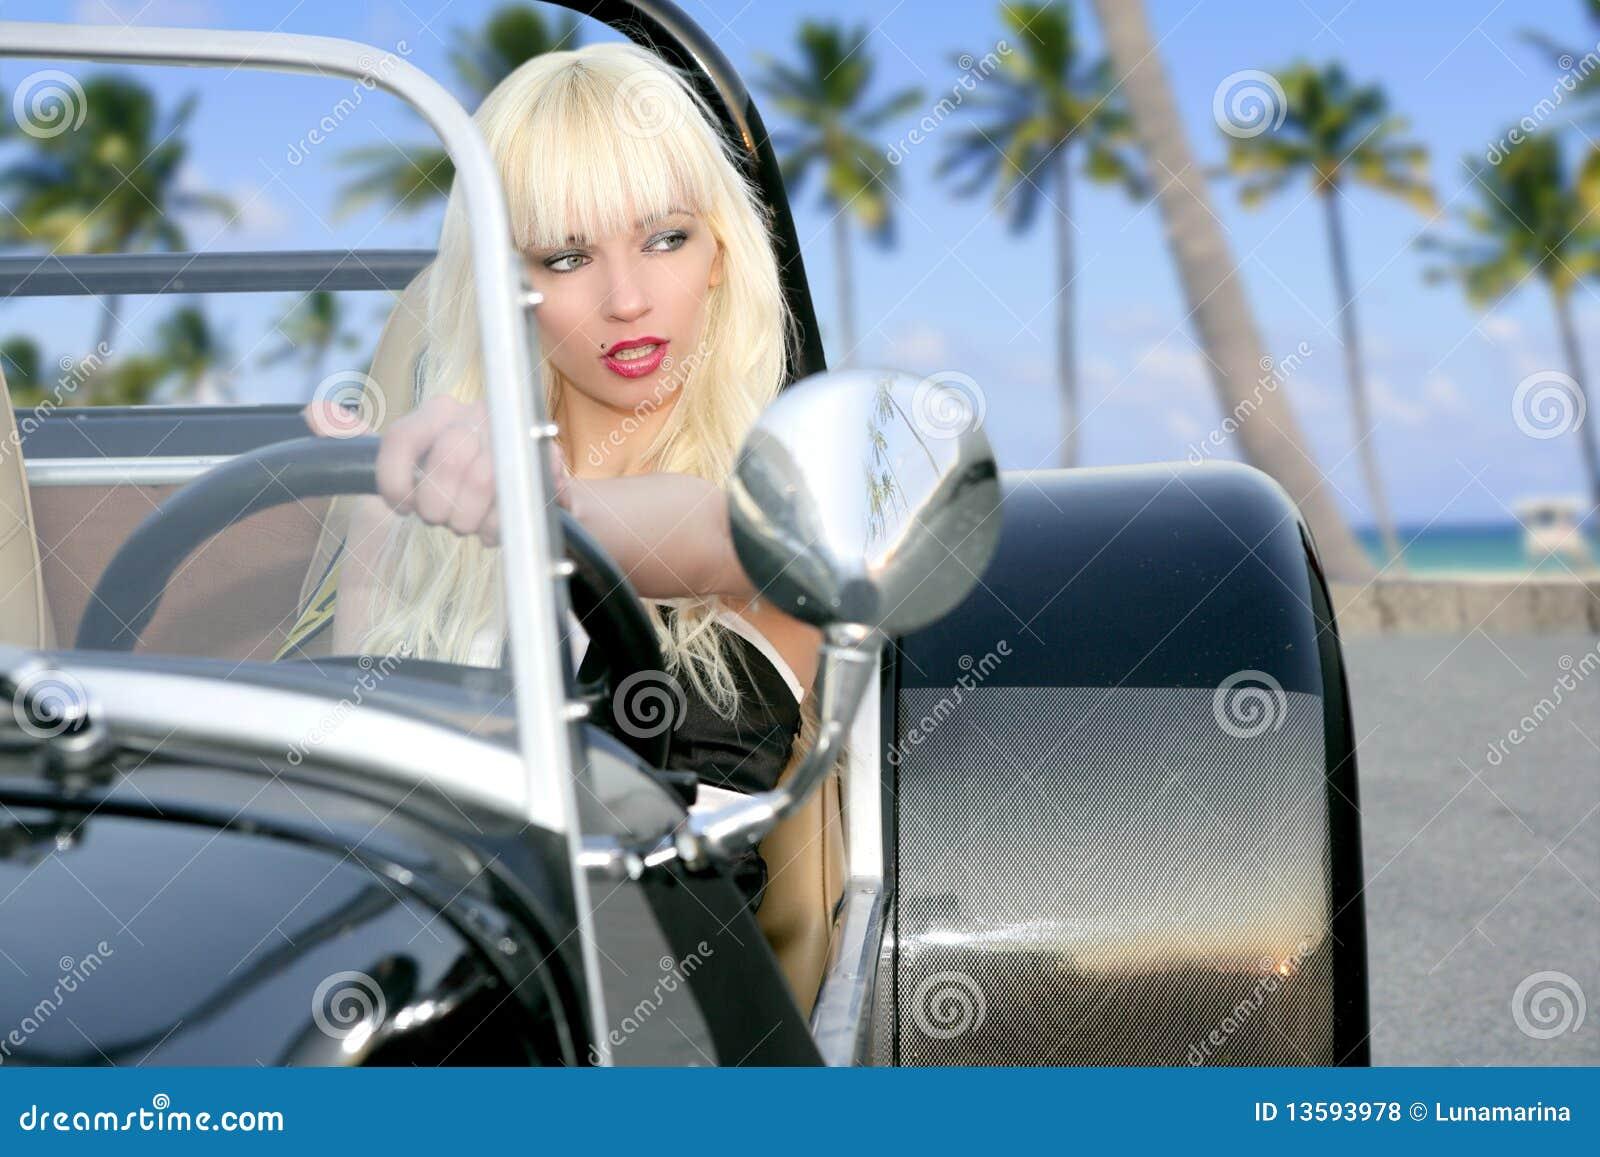 Sports Car Girl Blonde stock image. Image of model